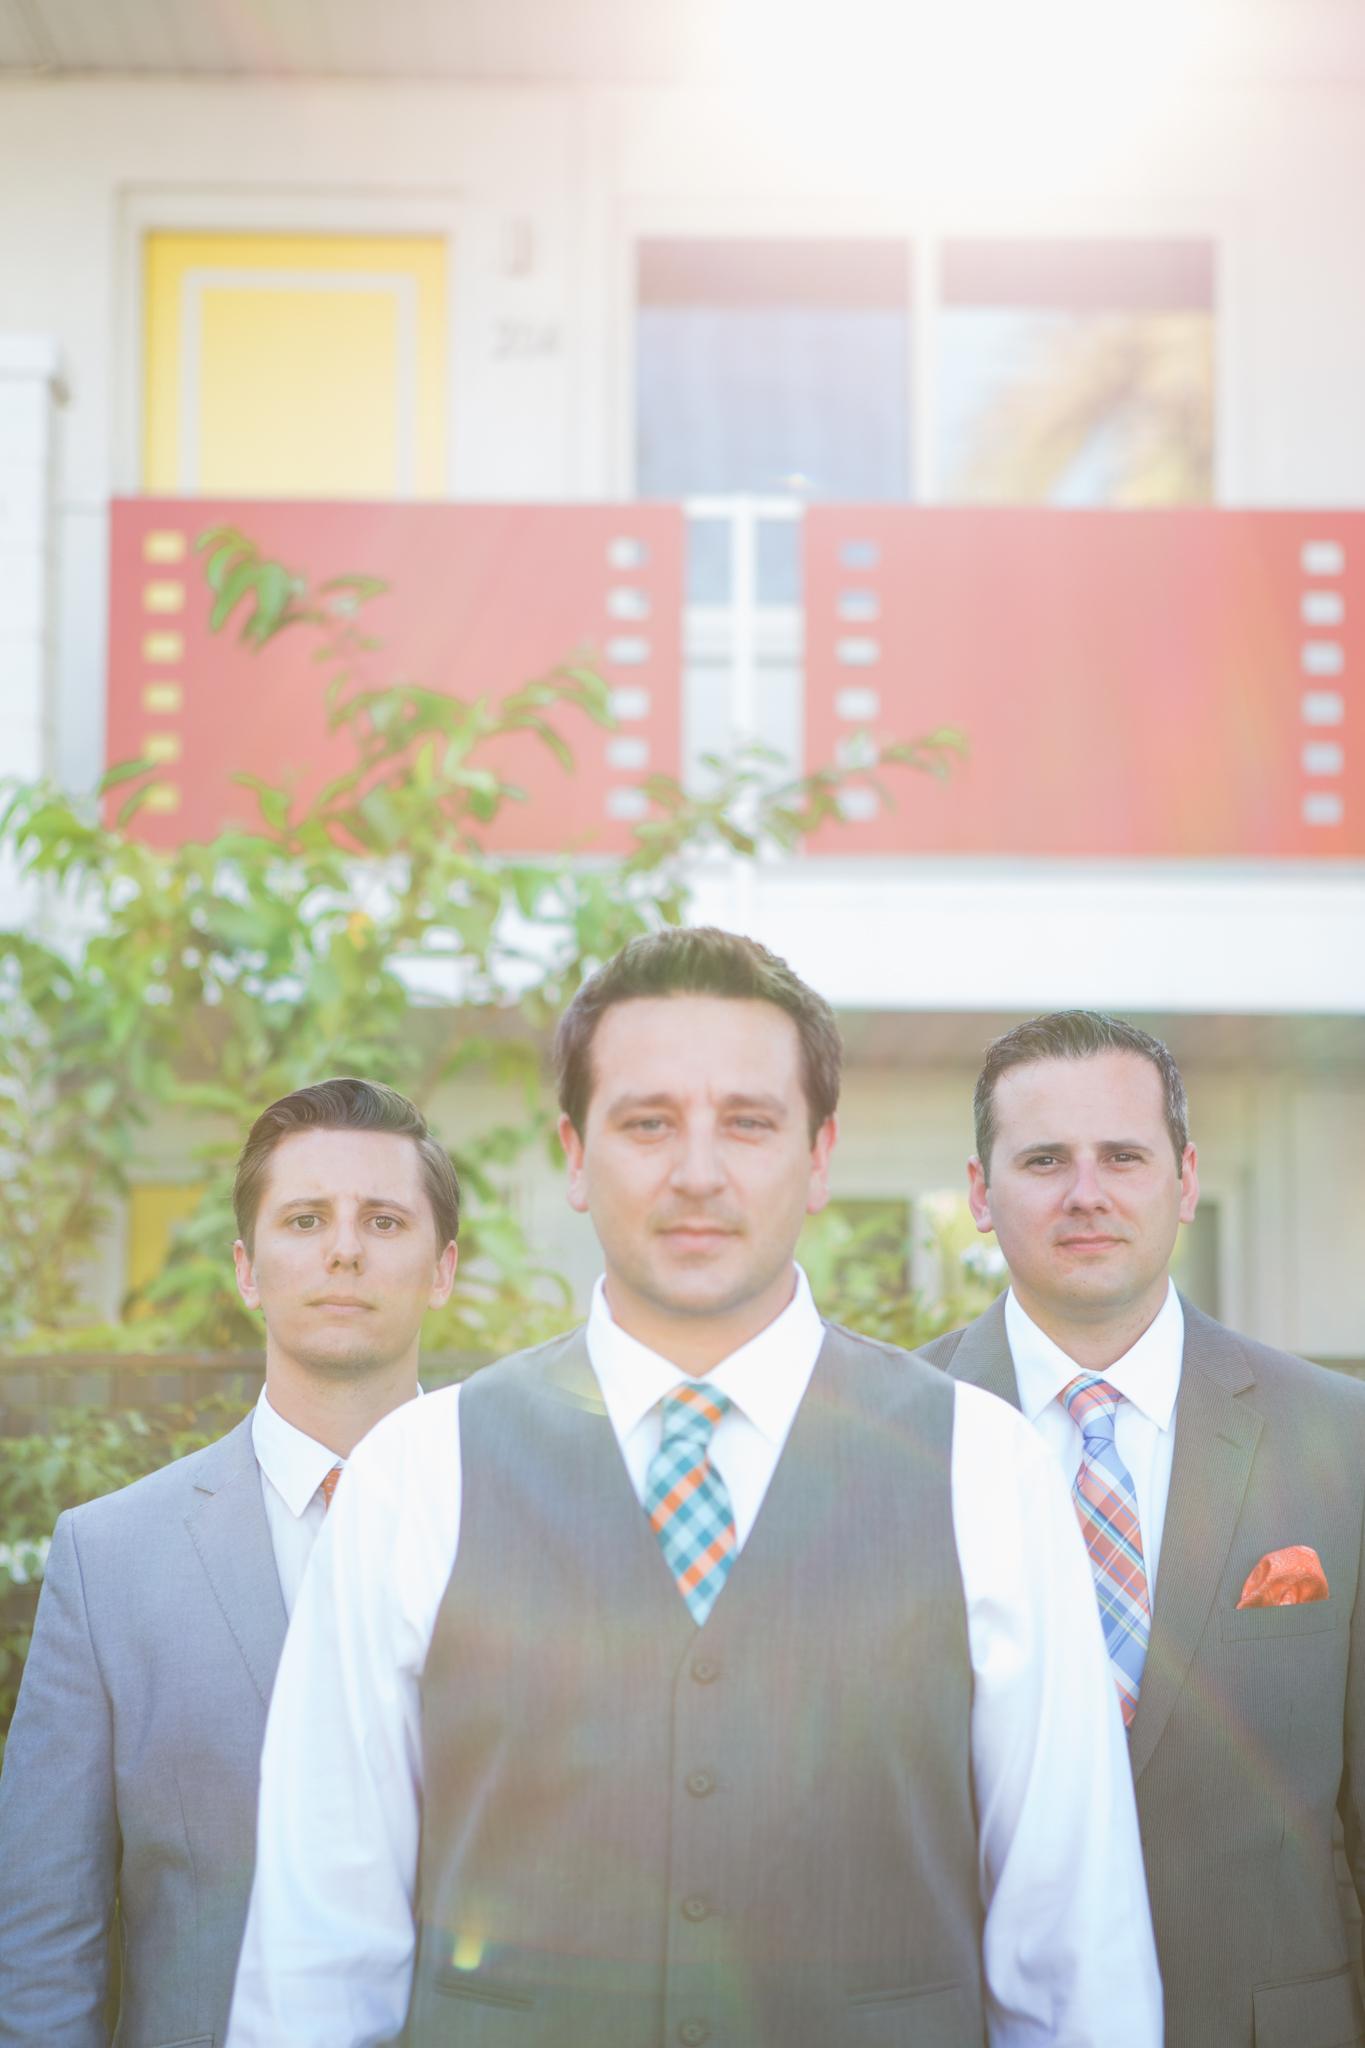 scottsdale-wedding-photographer-el-dorado-groom-brothers-epic-colorful-portrait